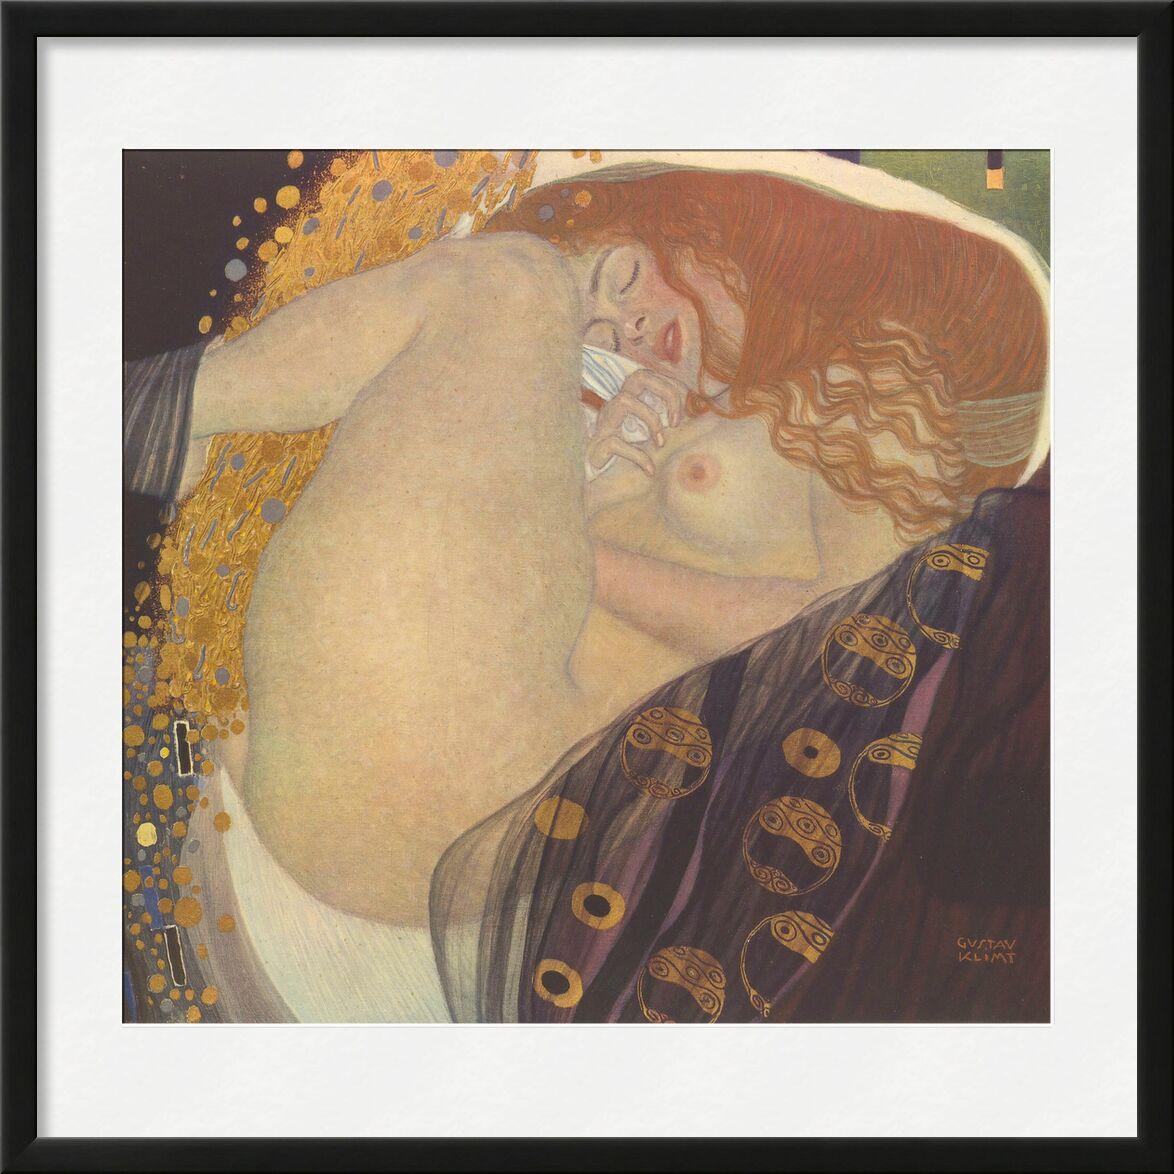 Danae I - Gustav Klimt von AUX BEAUX-ARTS, Prodi Art, KLIMT, Traum, Sonnenuntergang, Nacht, Blatt, Rotschopf, nackt, Frau, Malerei, Jugendstil